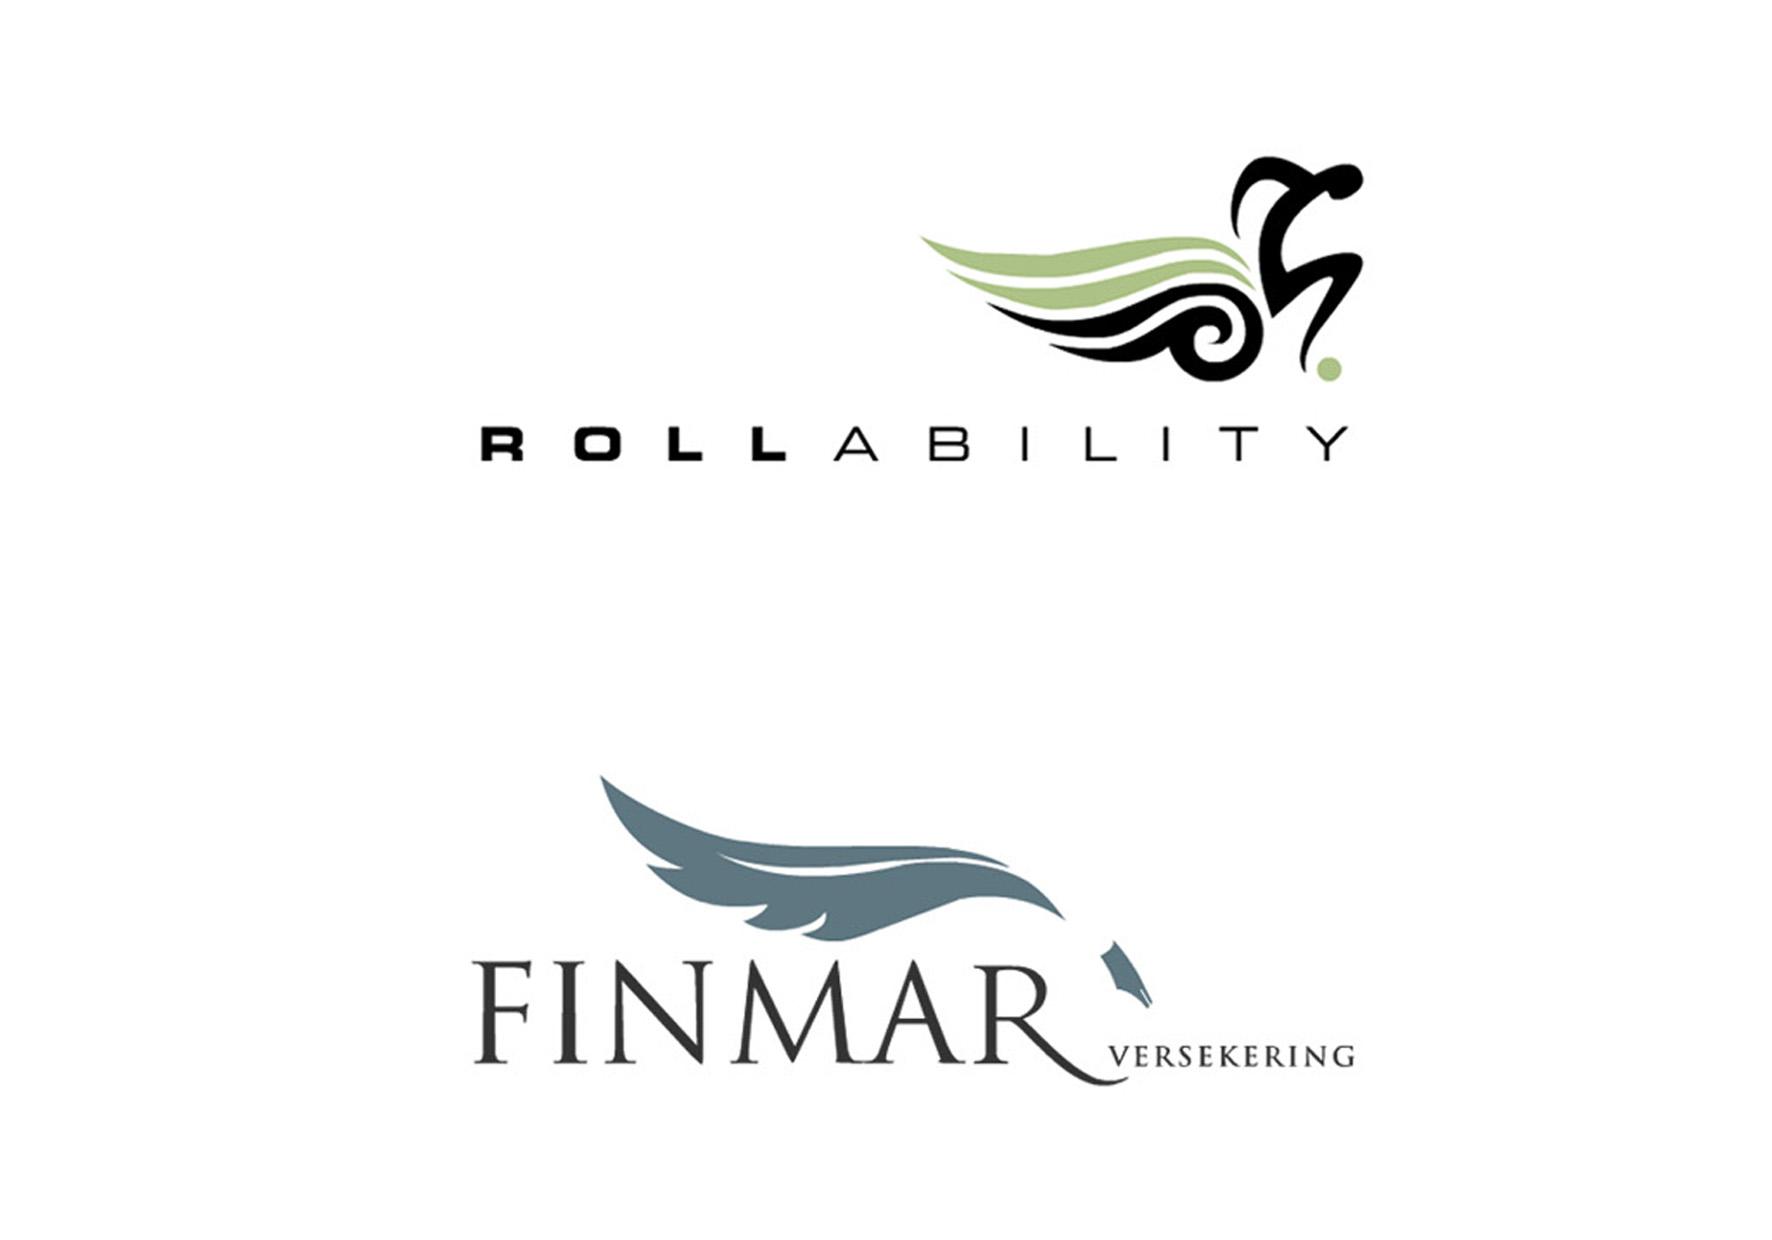 Rollability & Finmar